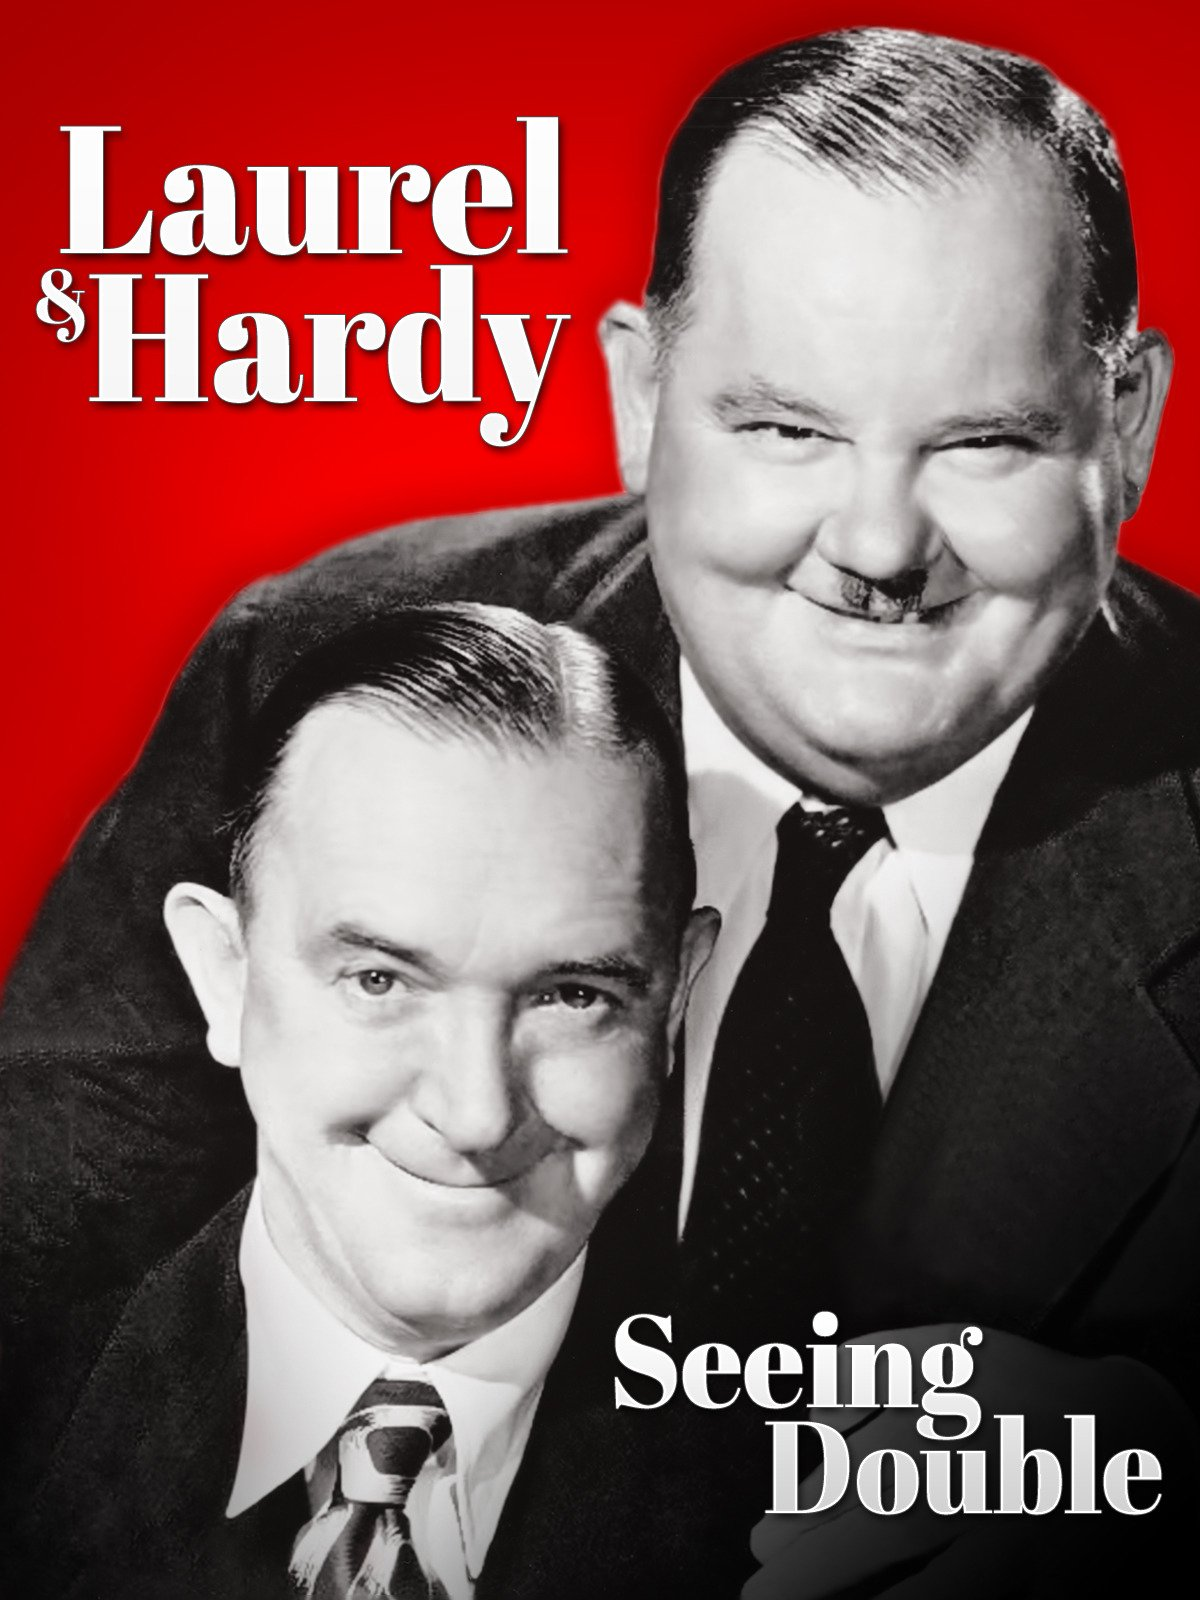 Laurel & Hardy: Seeing Double